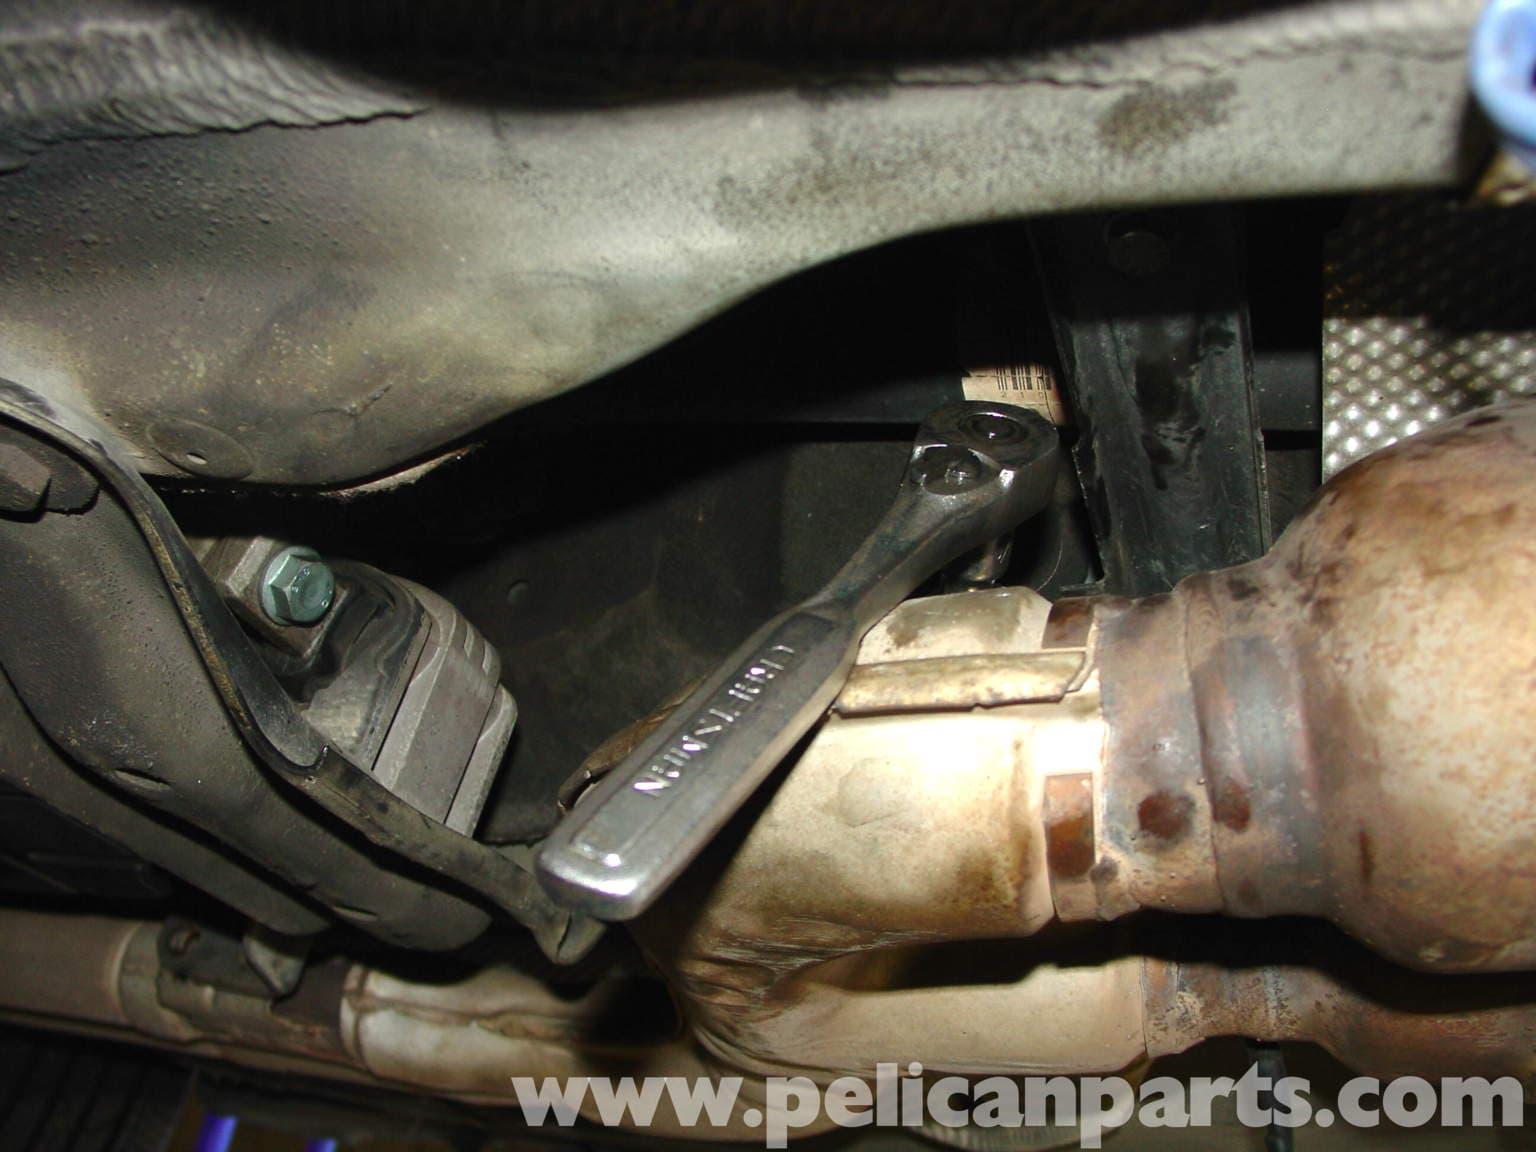 Mercedes Benz W210 Oxygen Sensor Replacement 1996 03